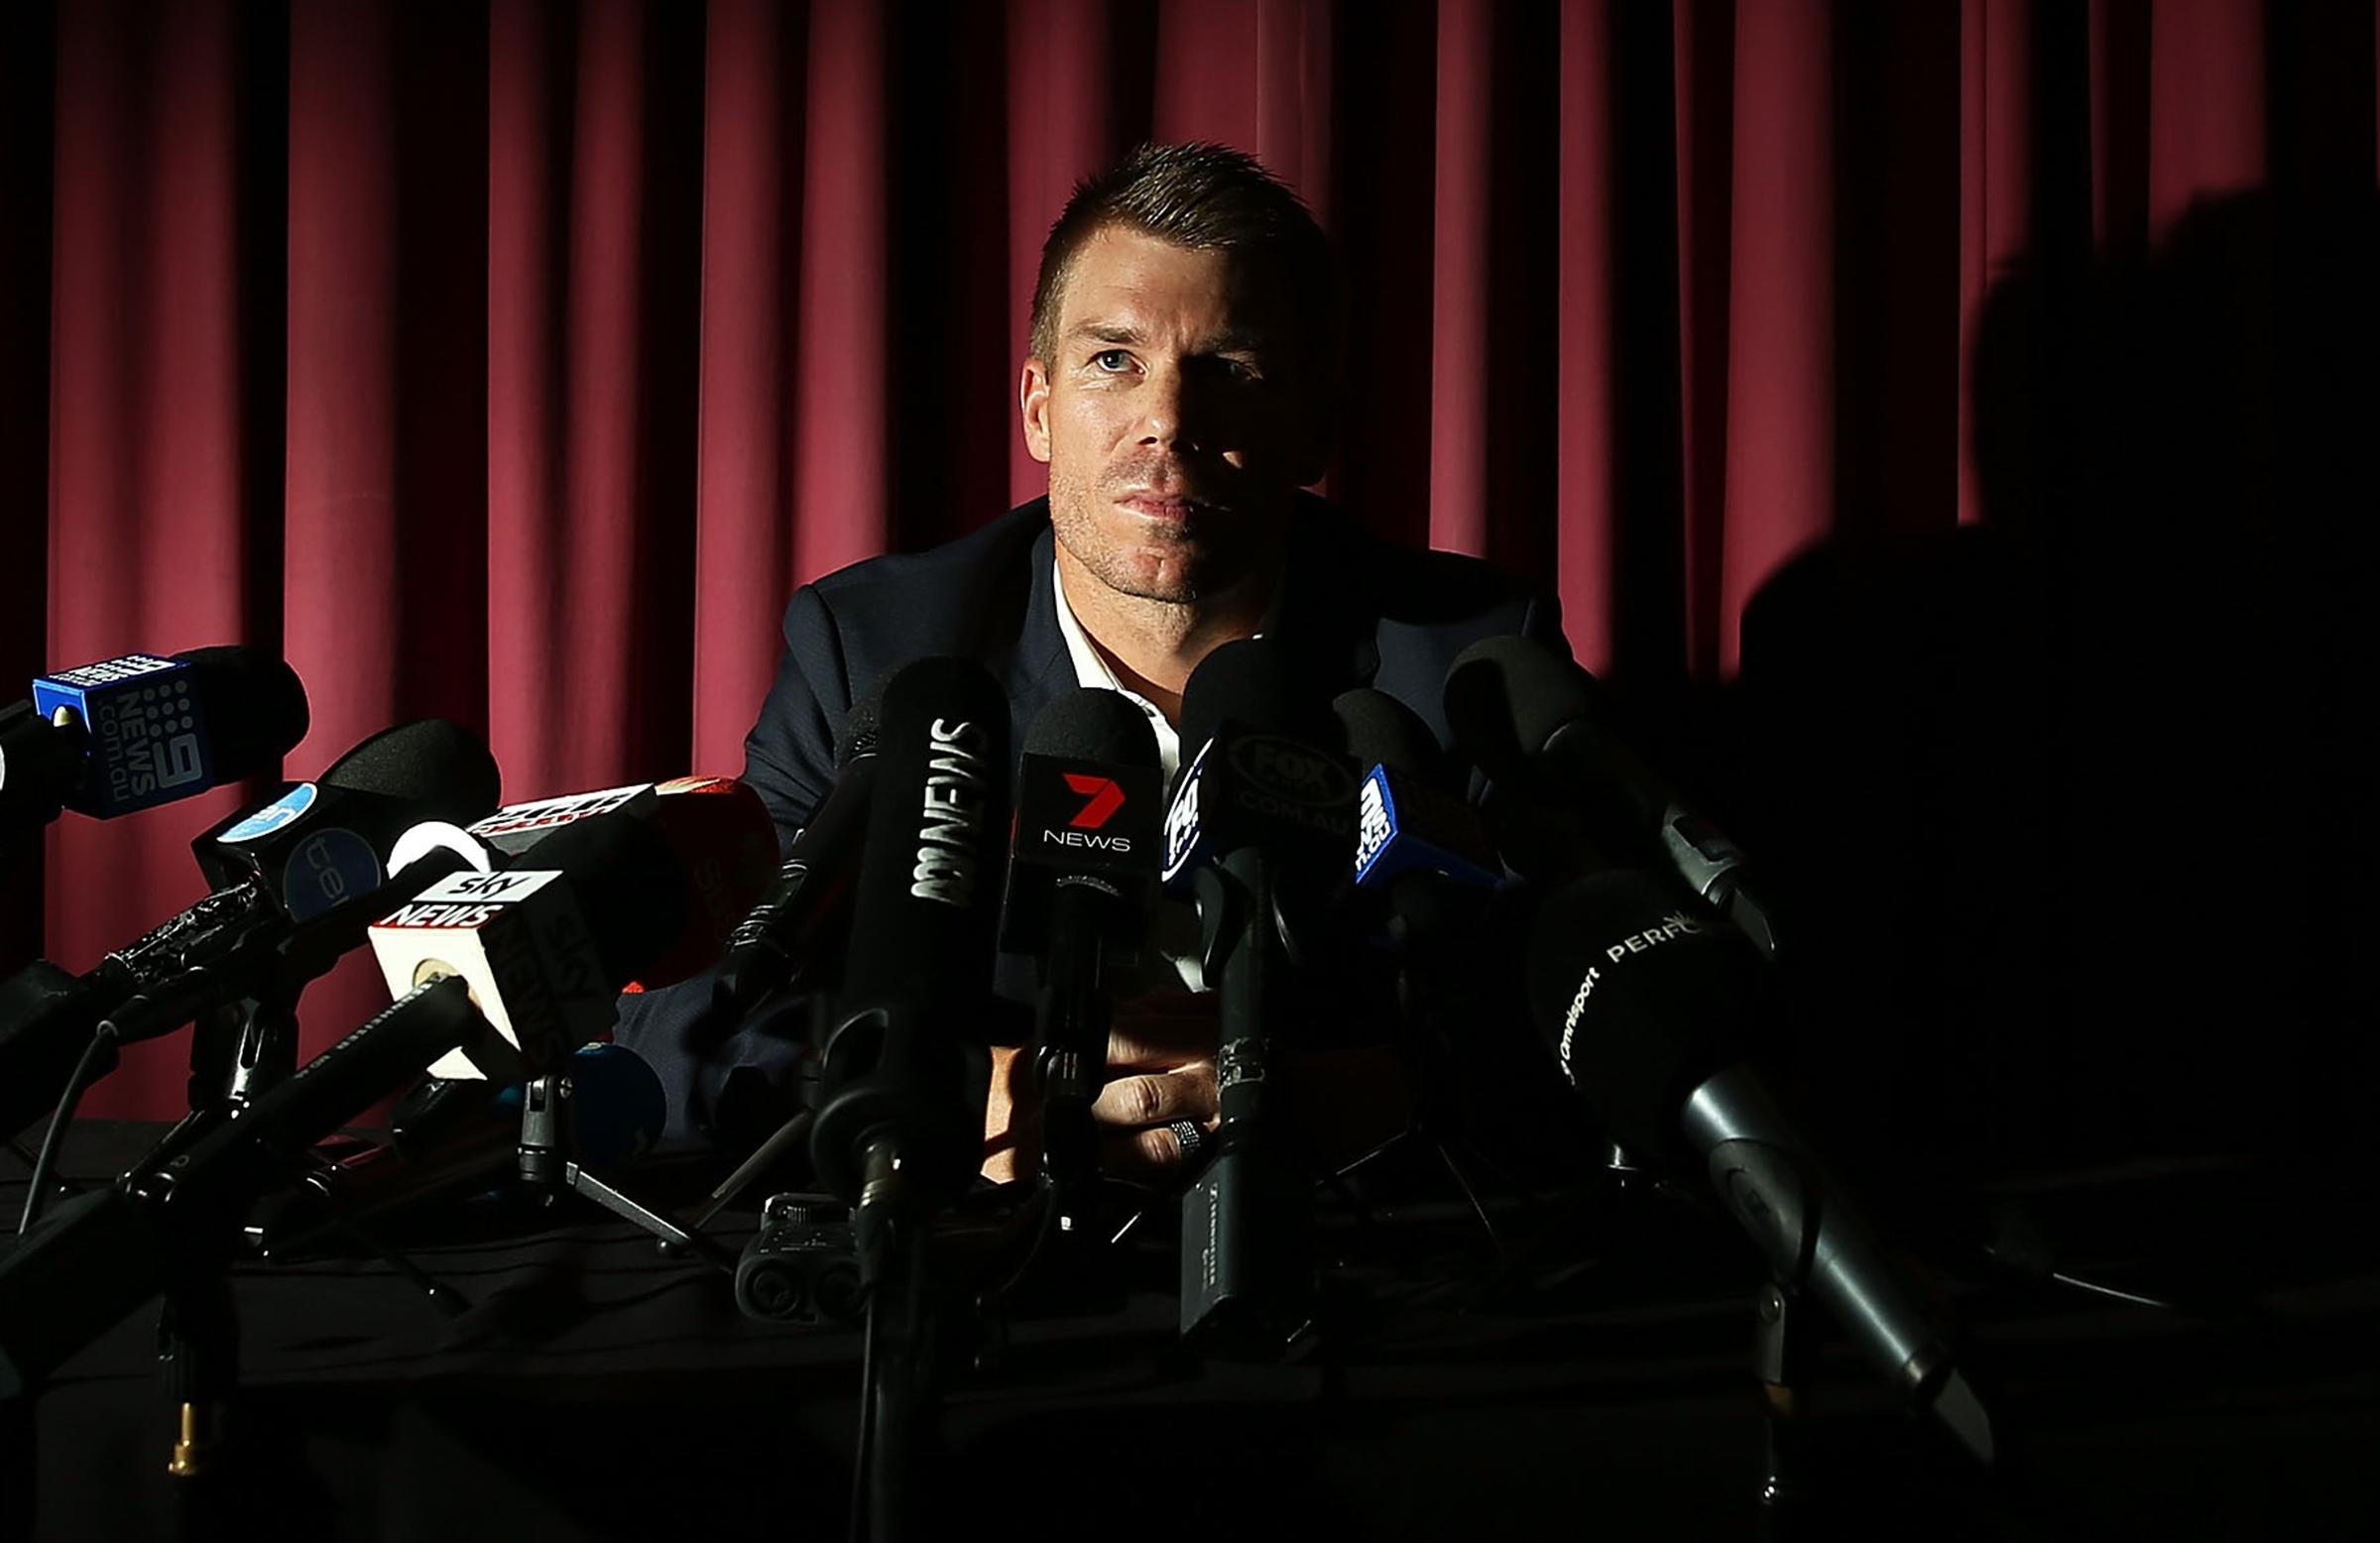 David Warner speaks to the media in Sydney // Getty